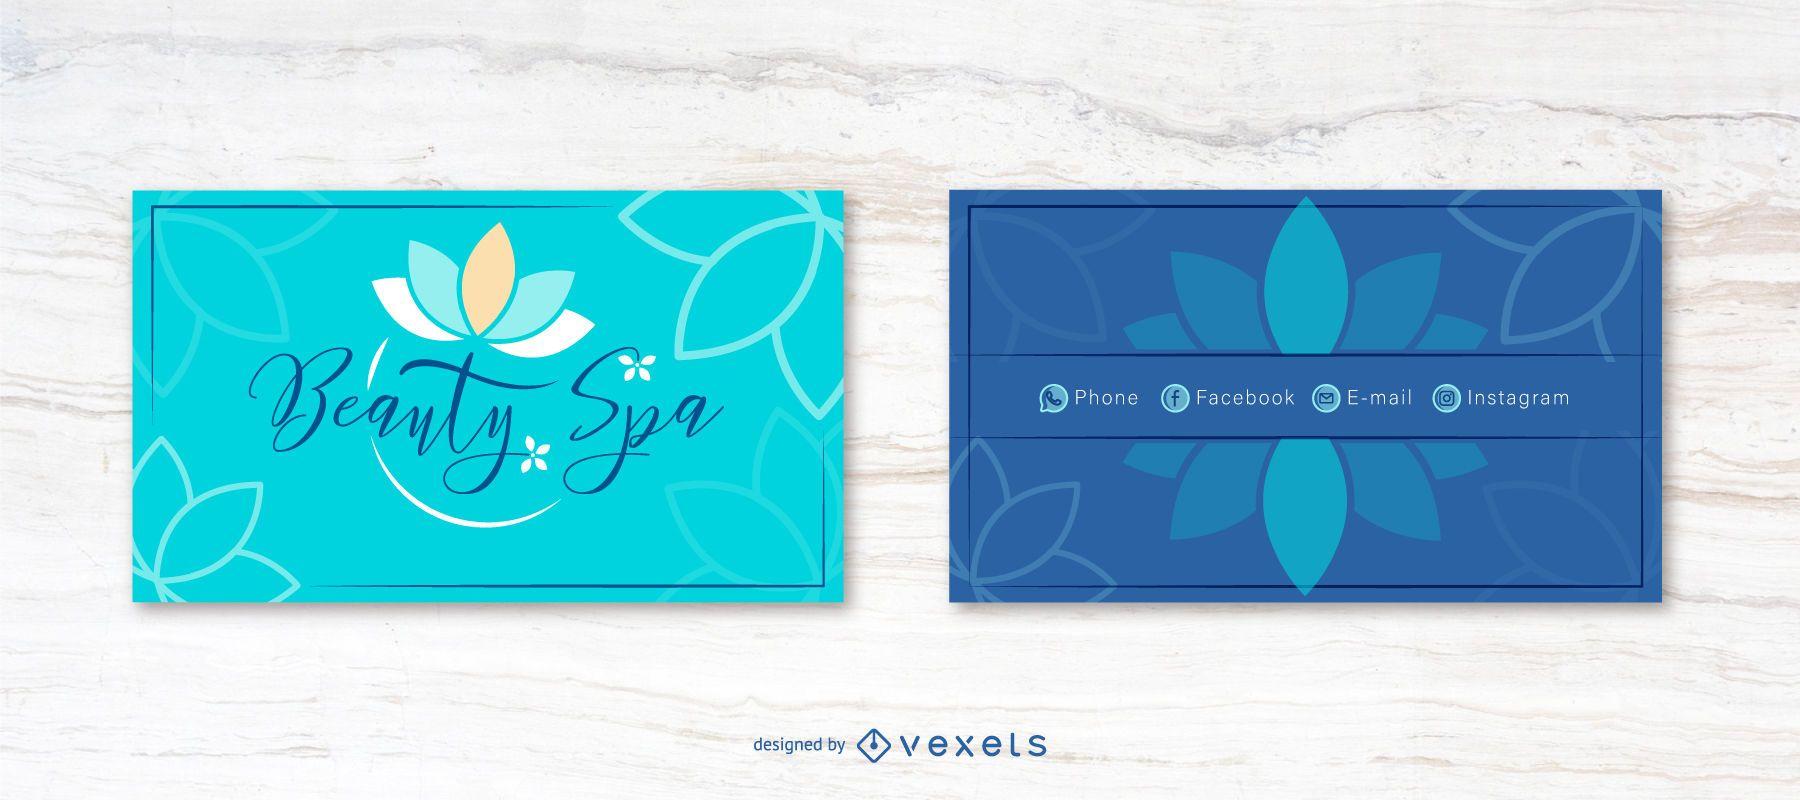 Beauty Spa Business Card Design